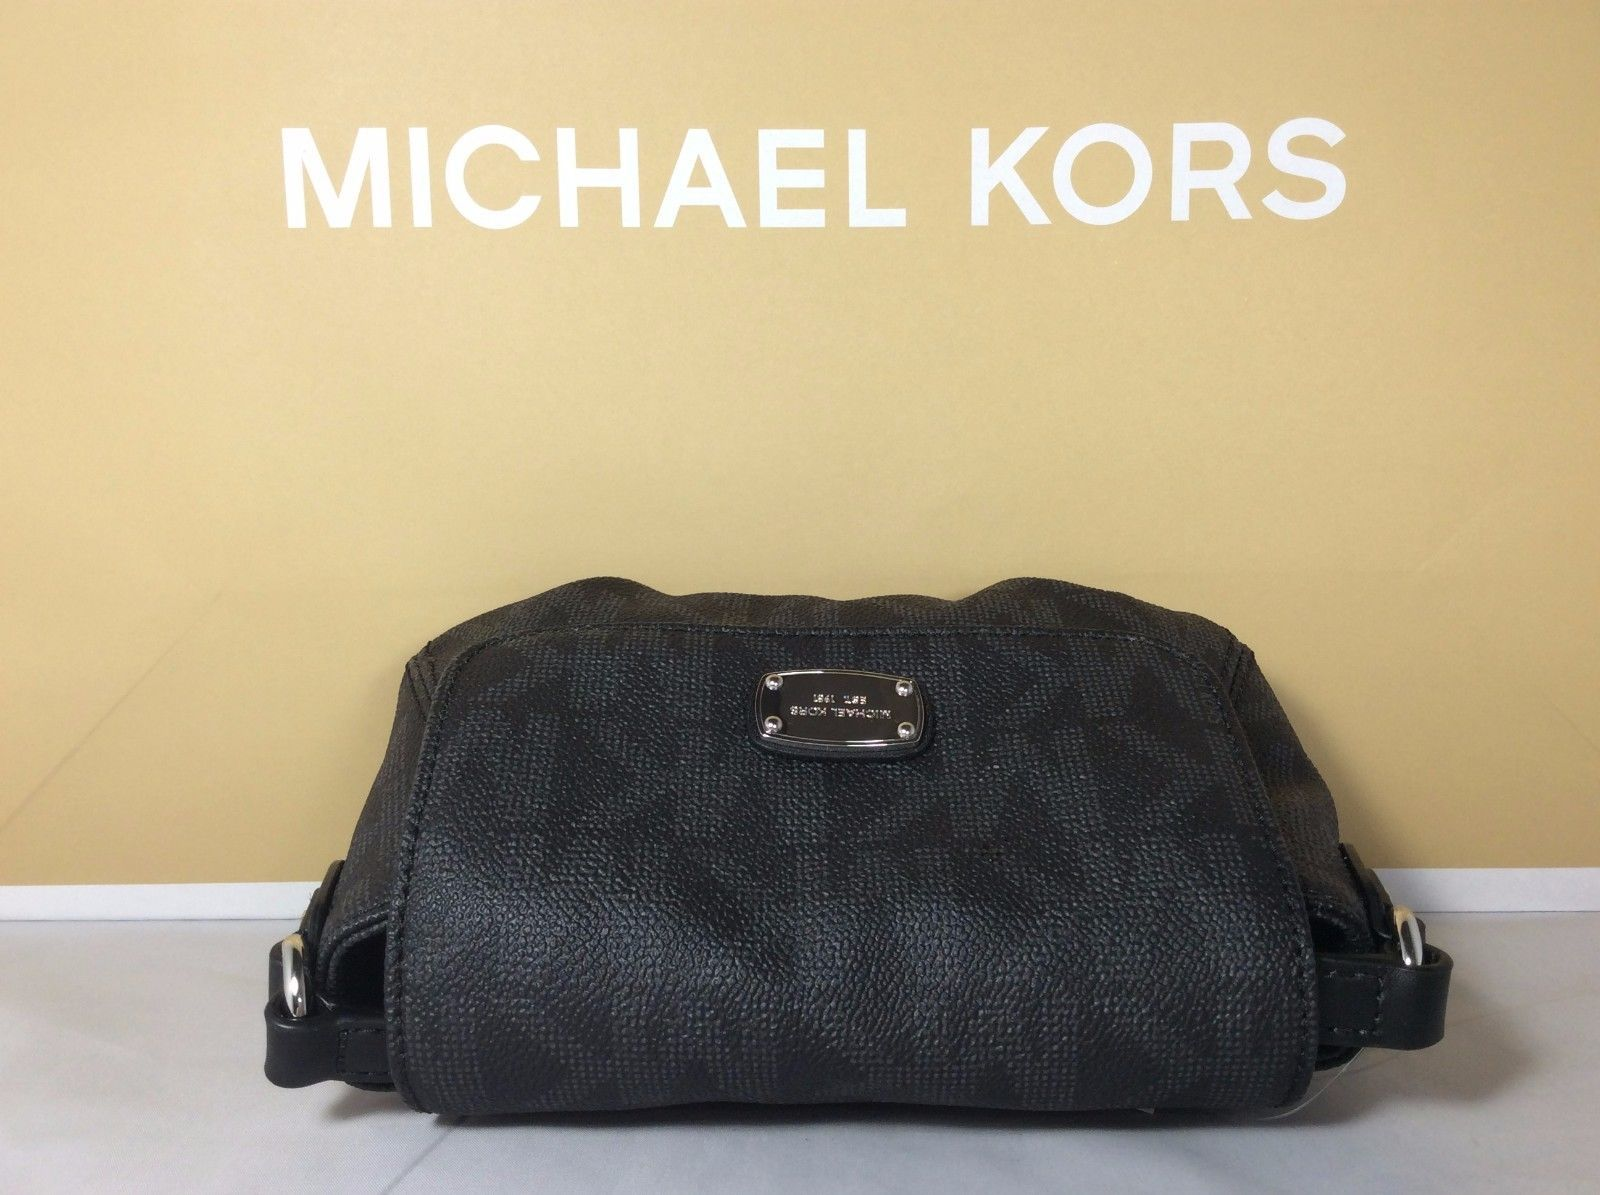 c0583baae0a3 NWT Authentic Michael Kors Black Signature PVC Small Flap Crossbody Bag  Purse  77.99